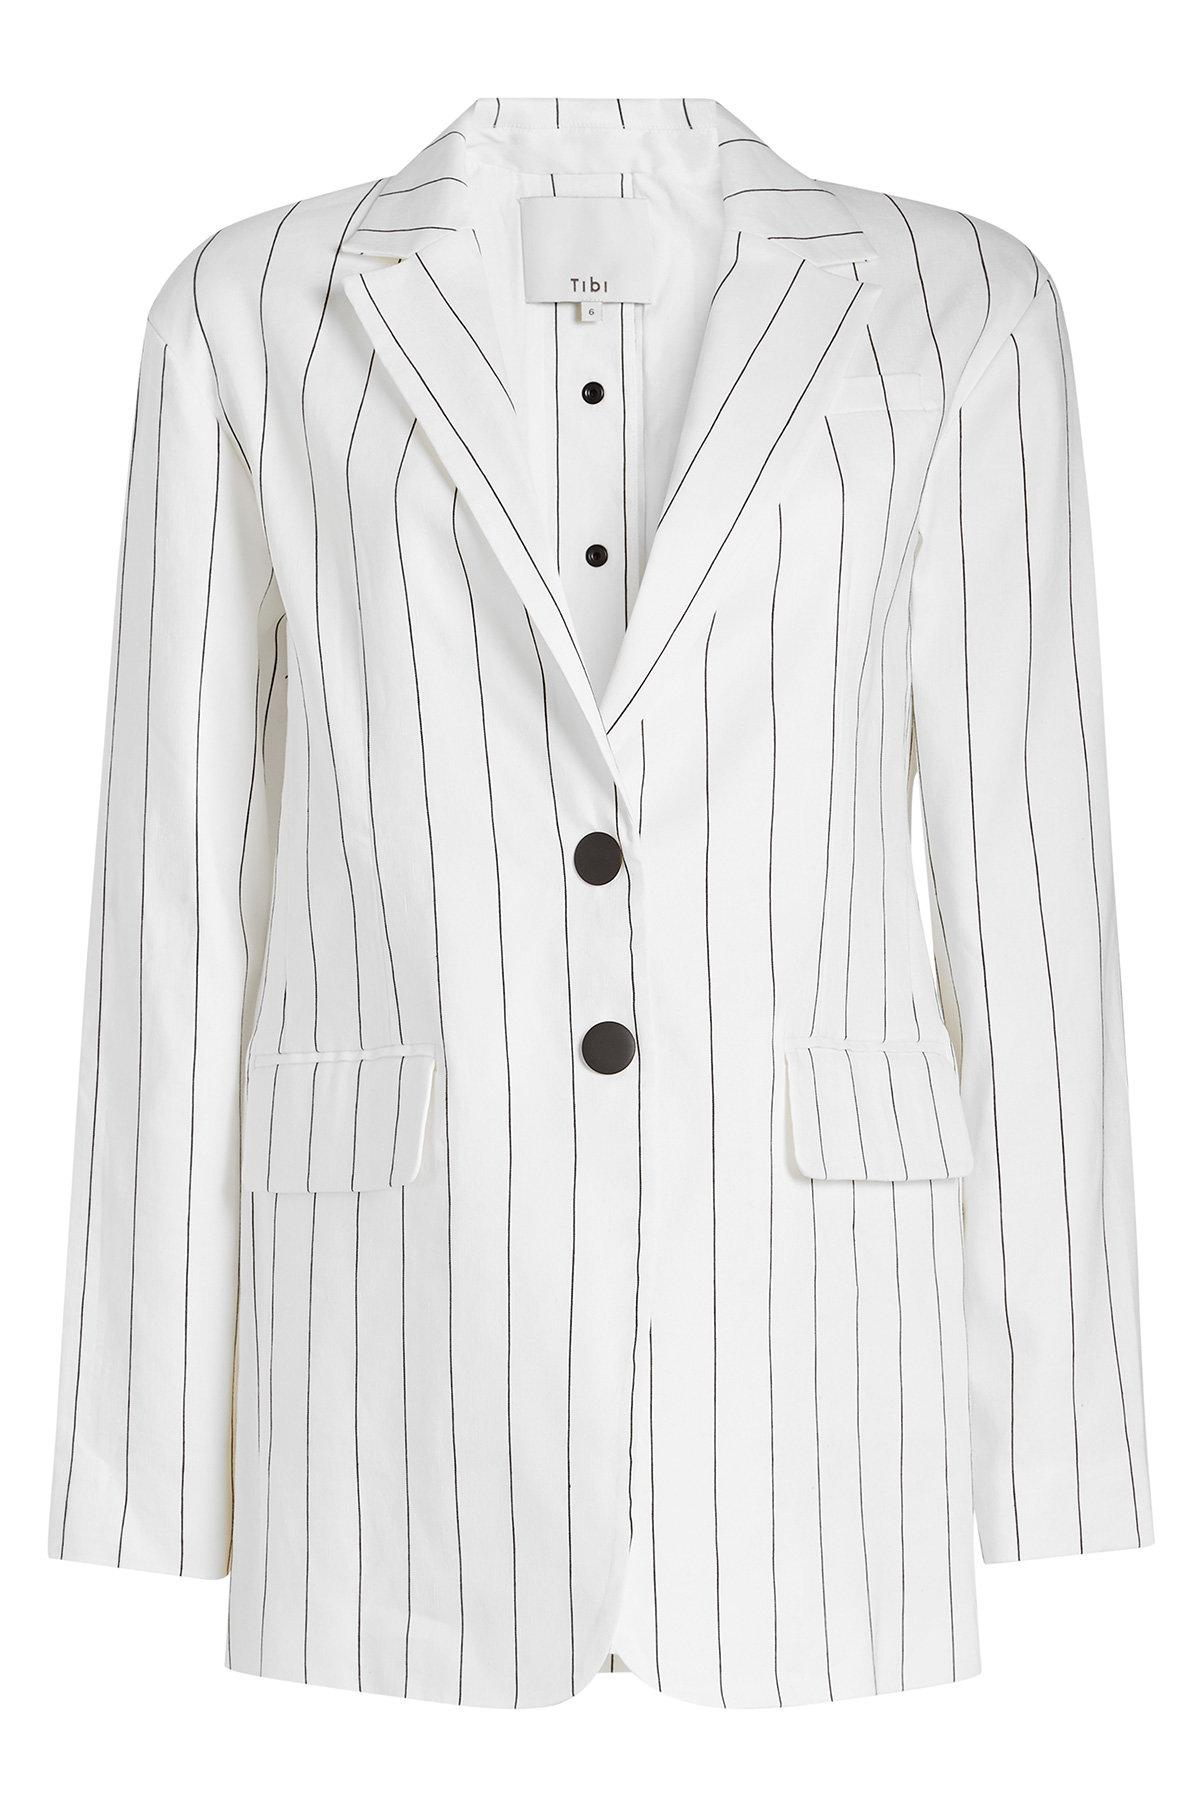 Tibi - White Striped Blazer In Linen - Lyst